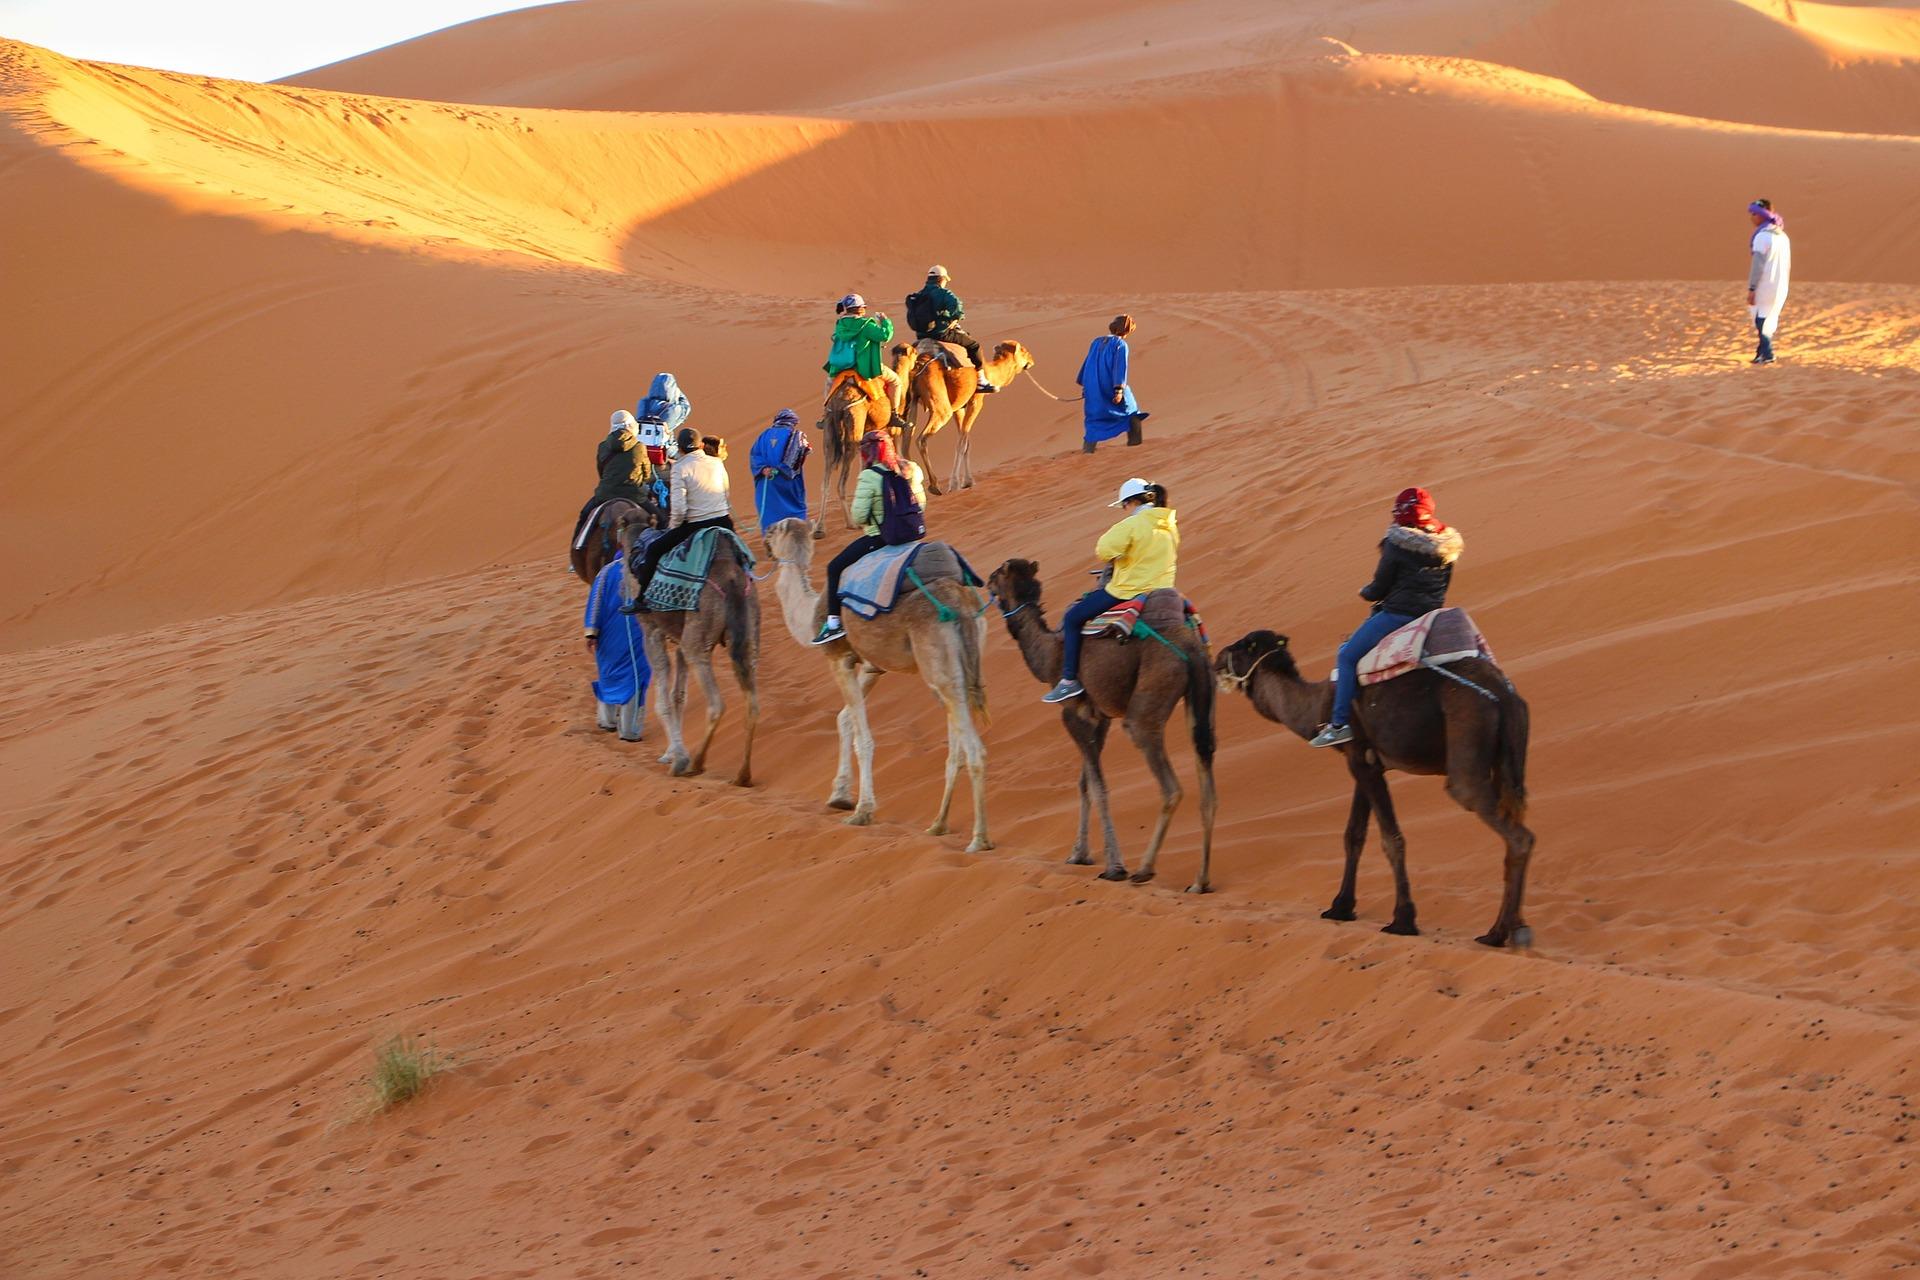 Sahara-Desert-Camping-Luxury-Desert-Camp